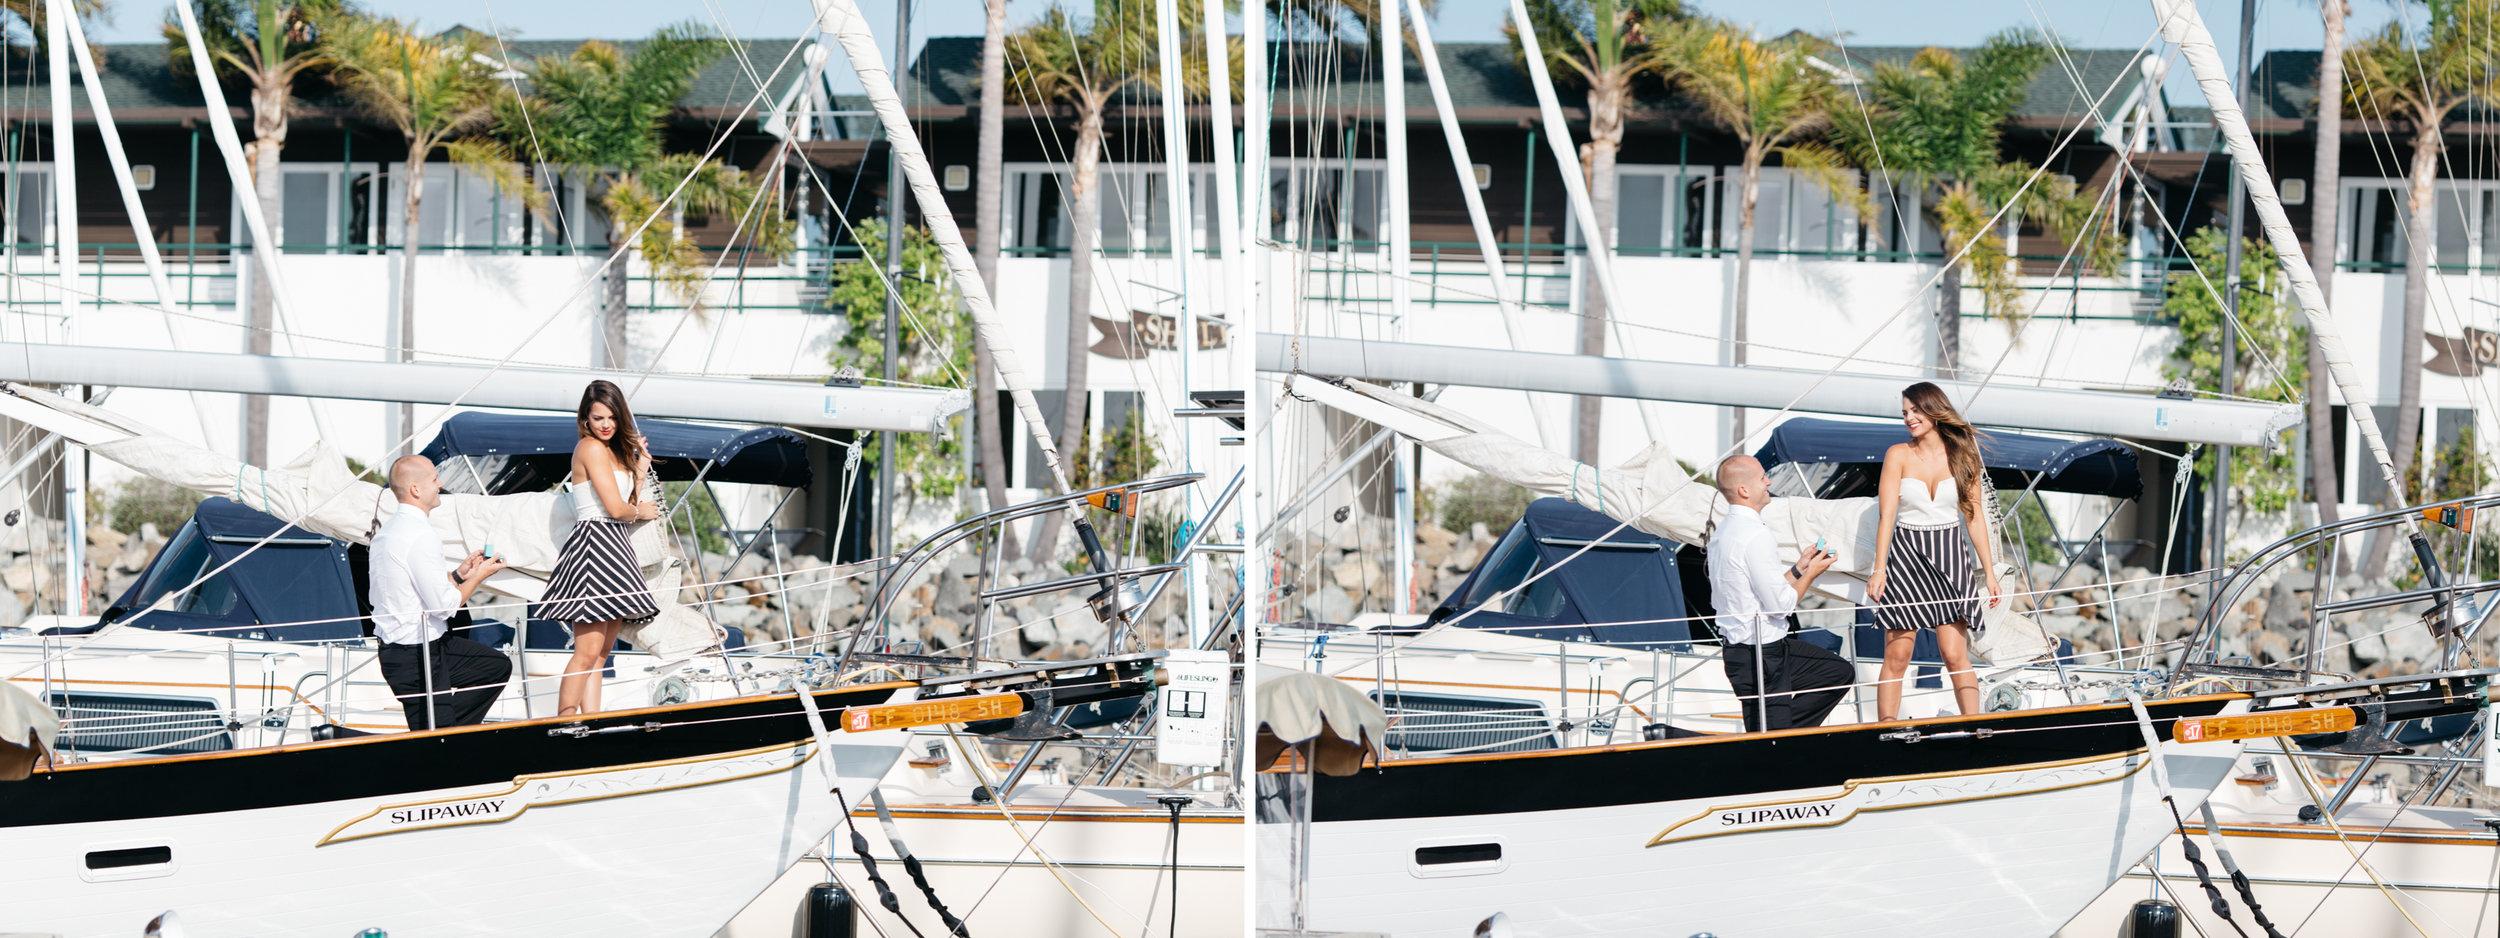 SamErica Studios - 4th of July Boat Proposal San Diego